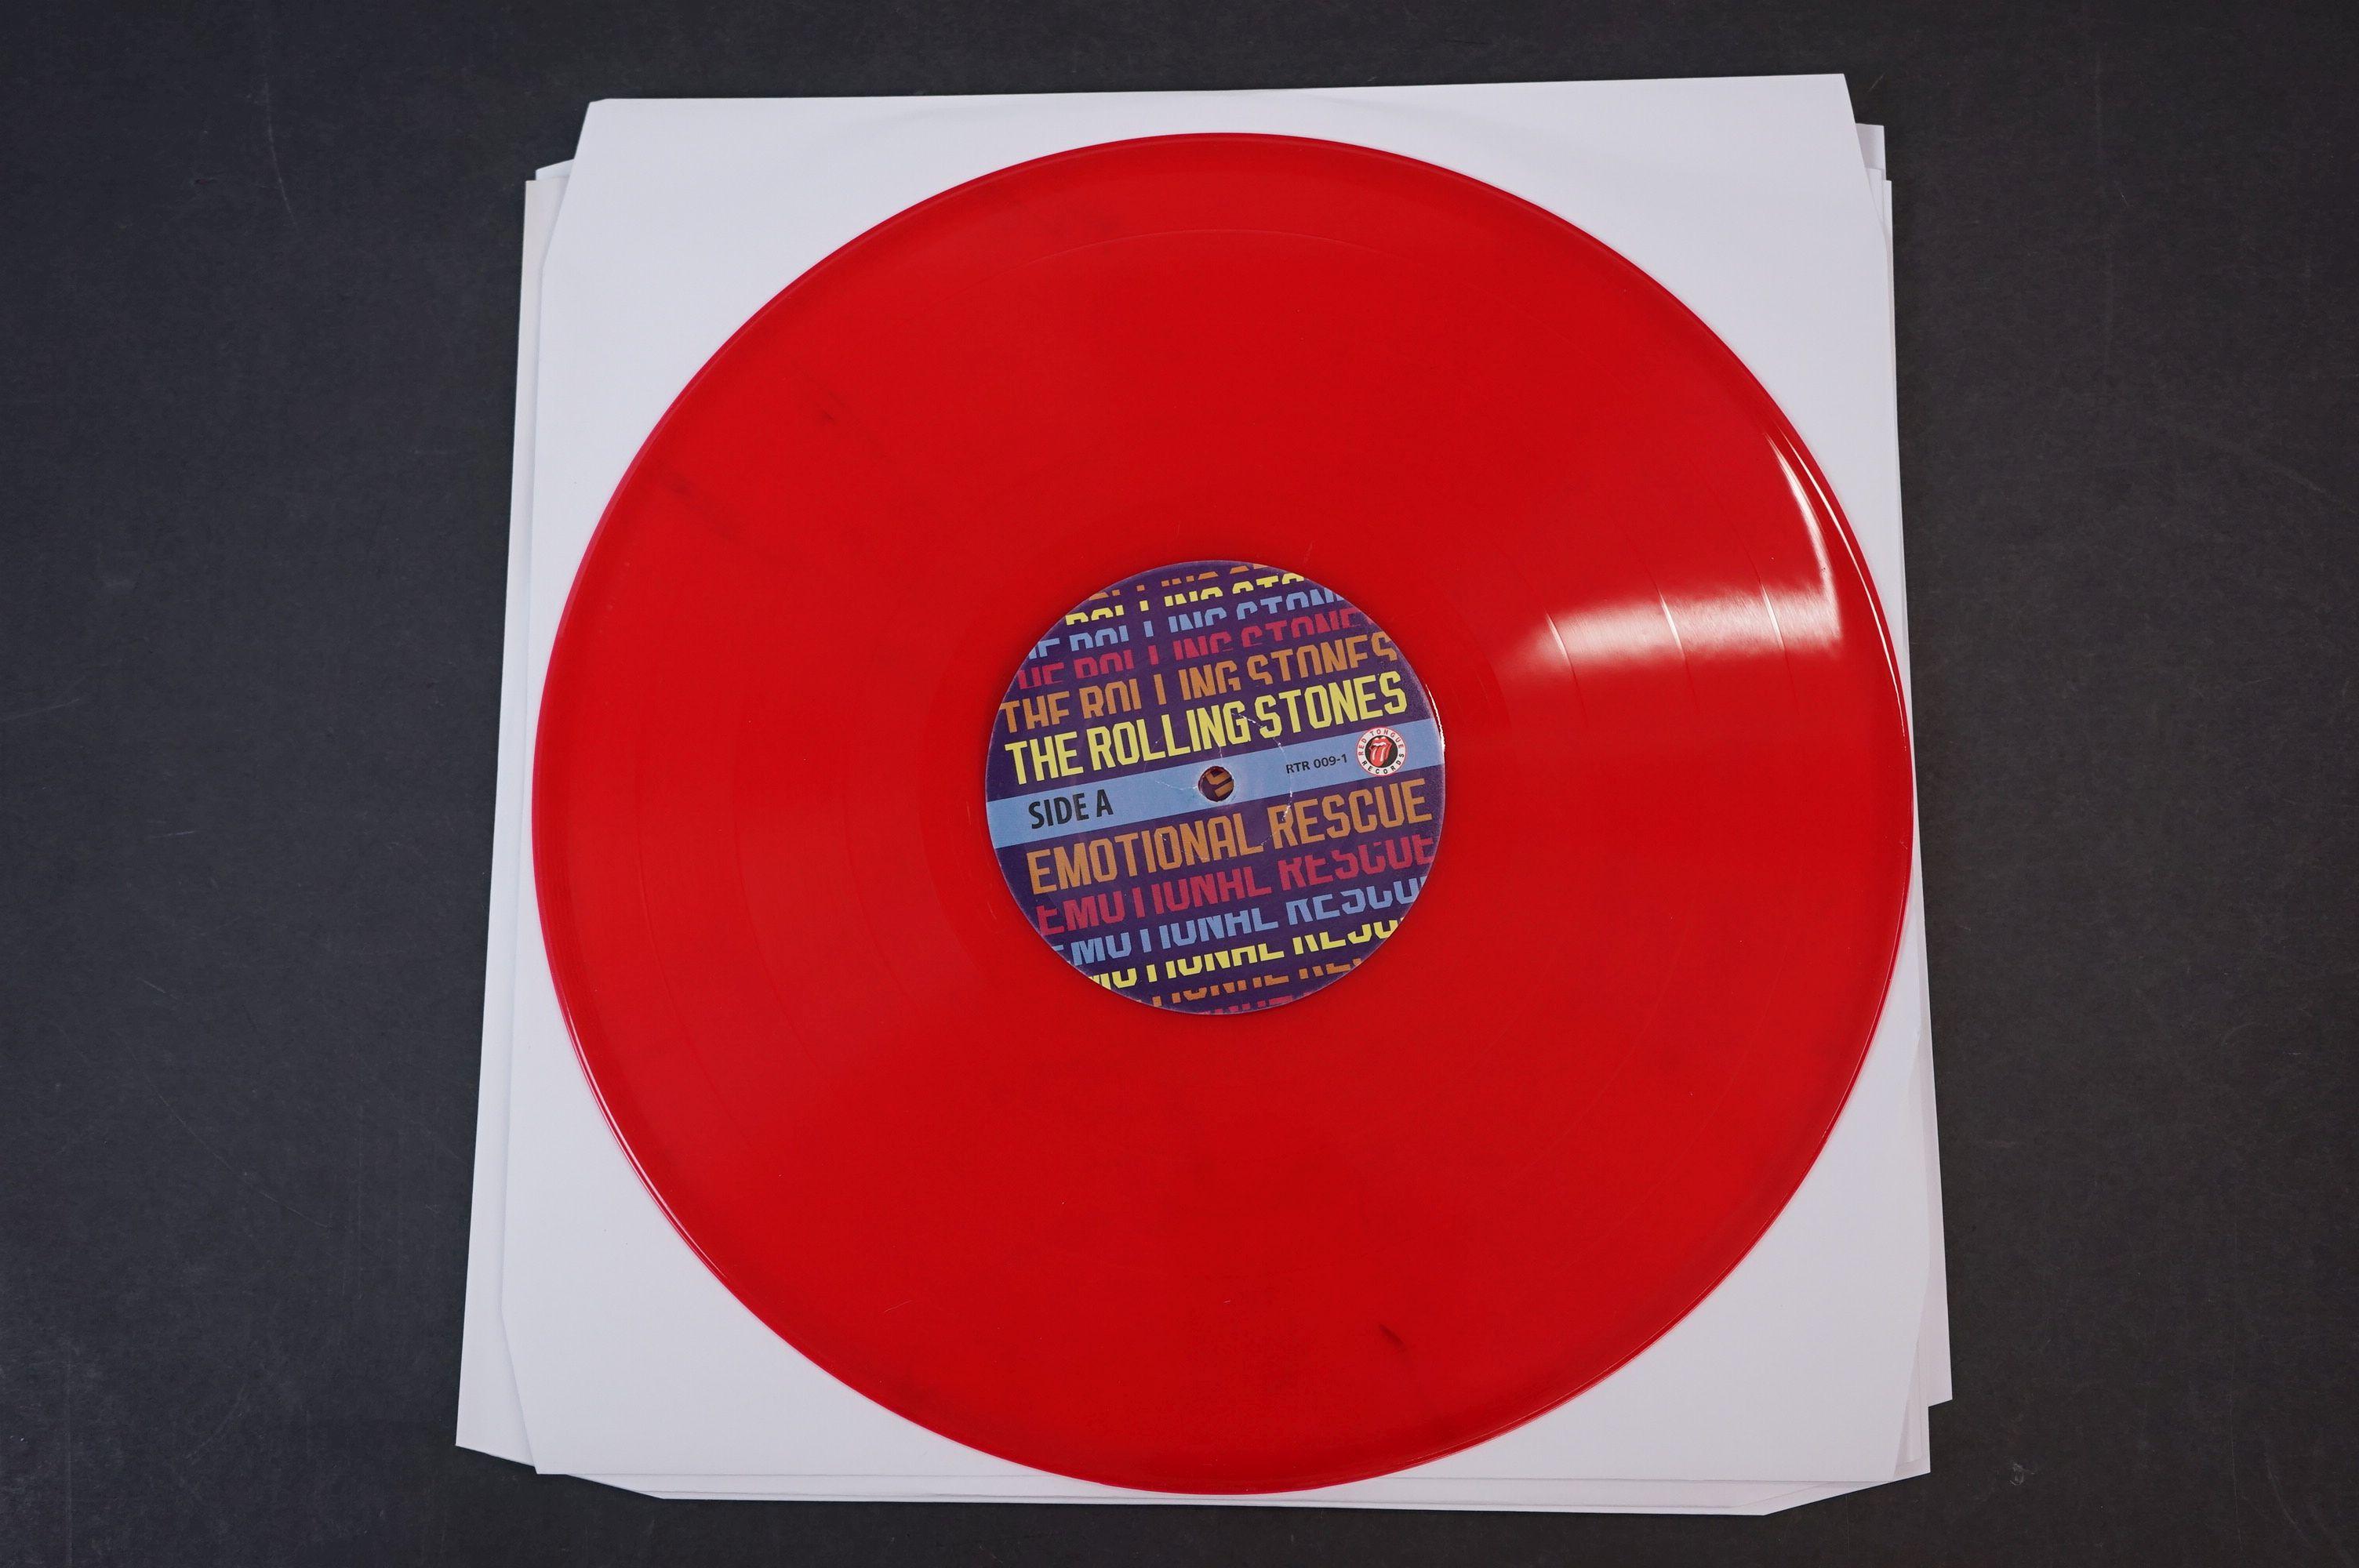 Vinyl - ltd edn The Real Alternate Album Rolling Stones Emotional Rescue 4 LP / 2 CD Box Set, - Image 6 of 12